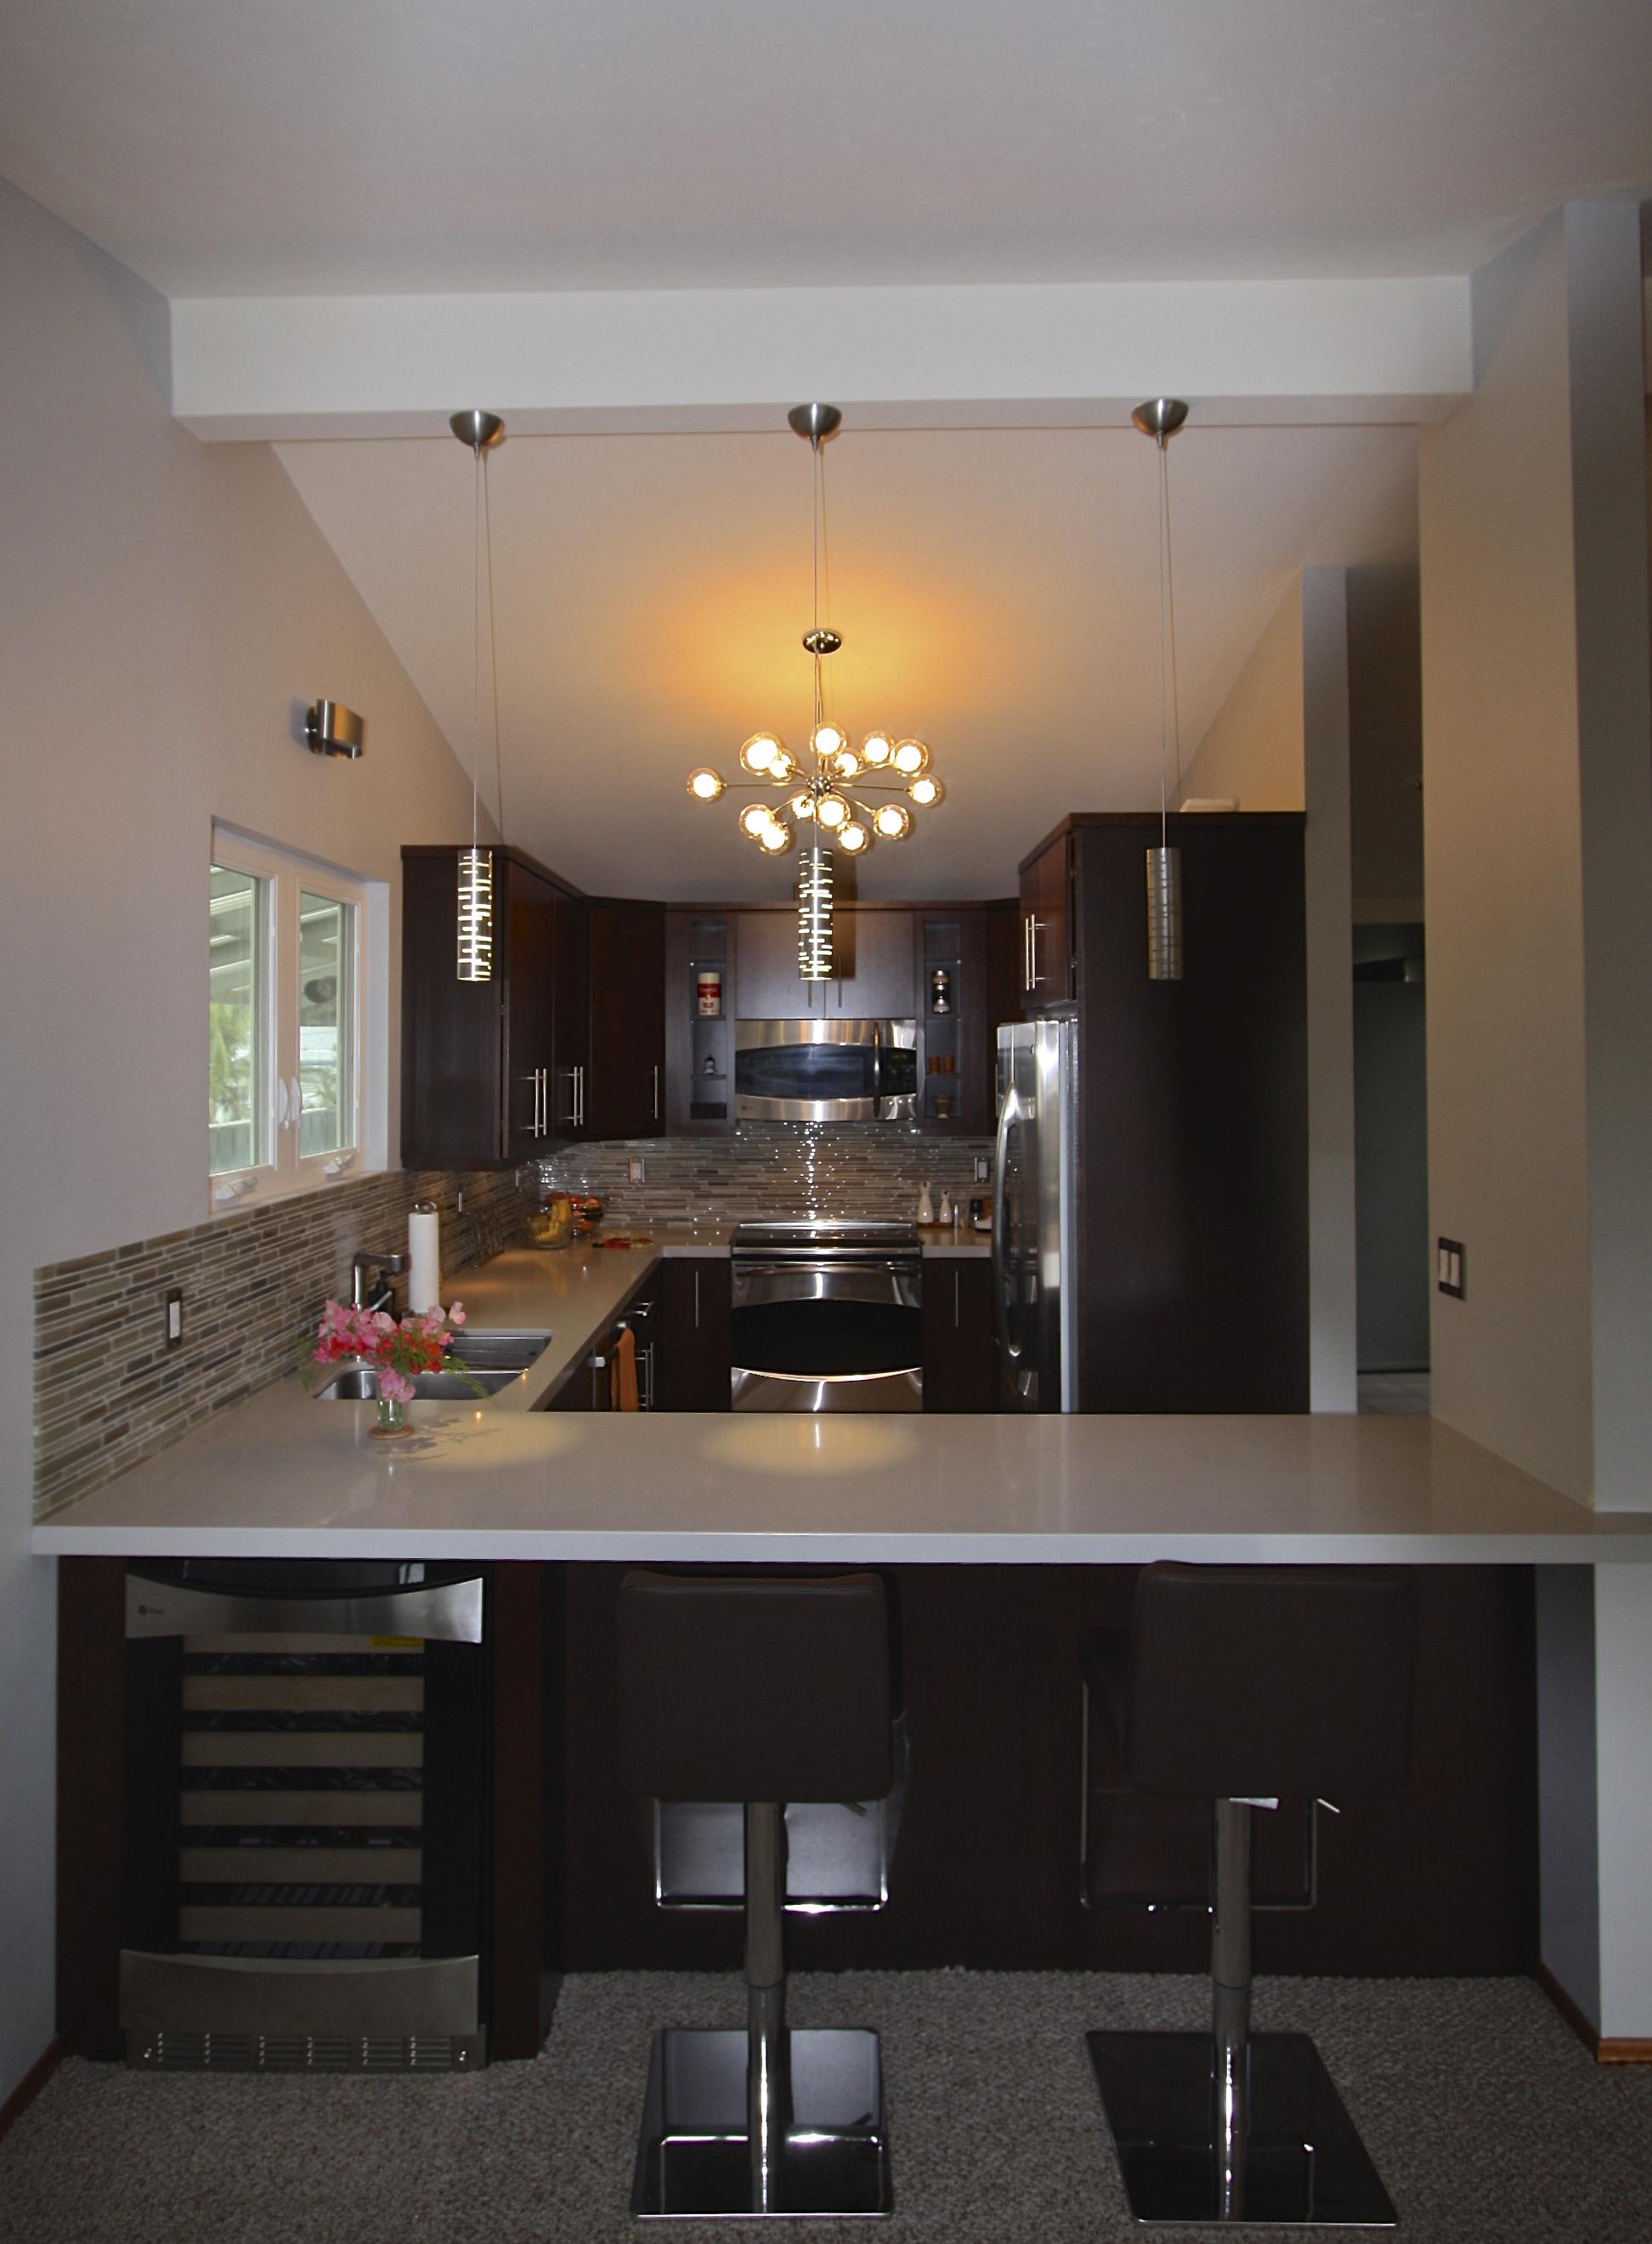 EAB Contemporary Kitchen Remodel 5.jpg